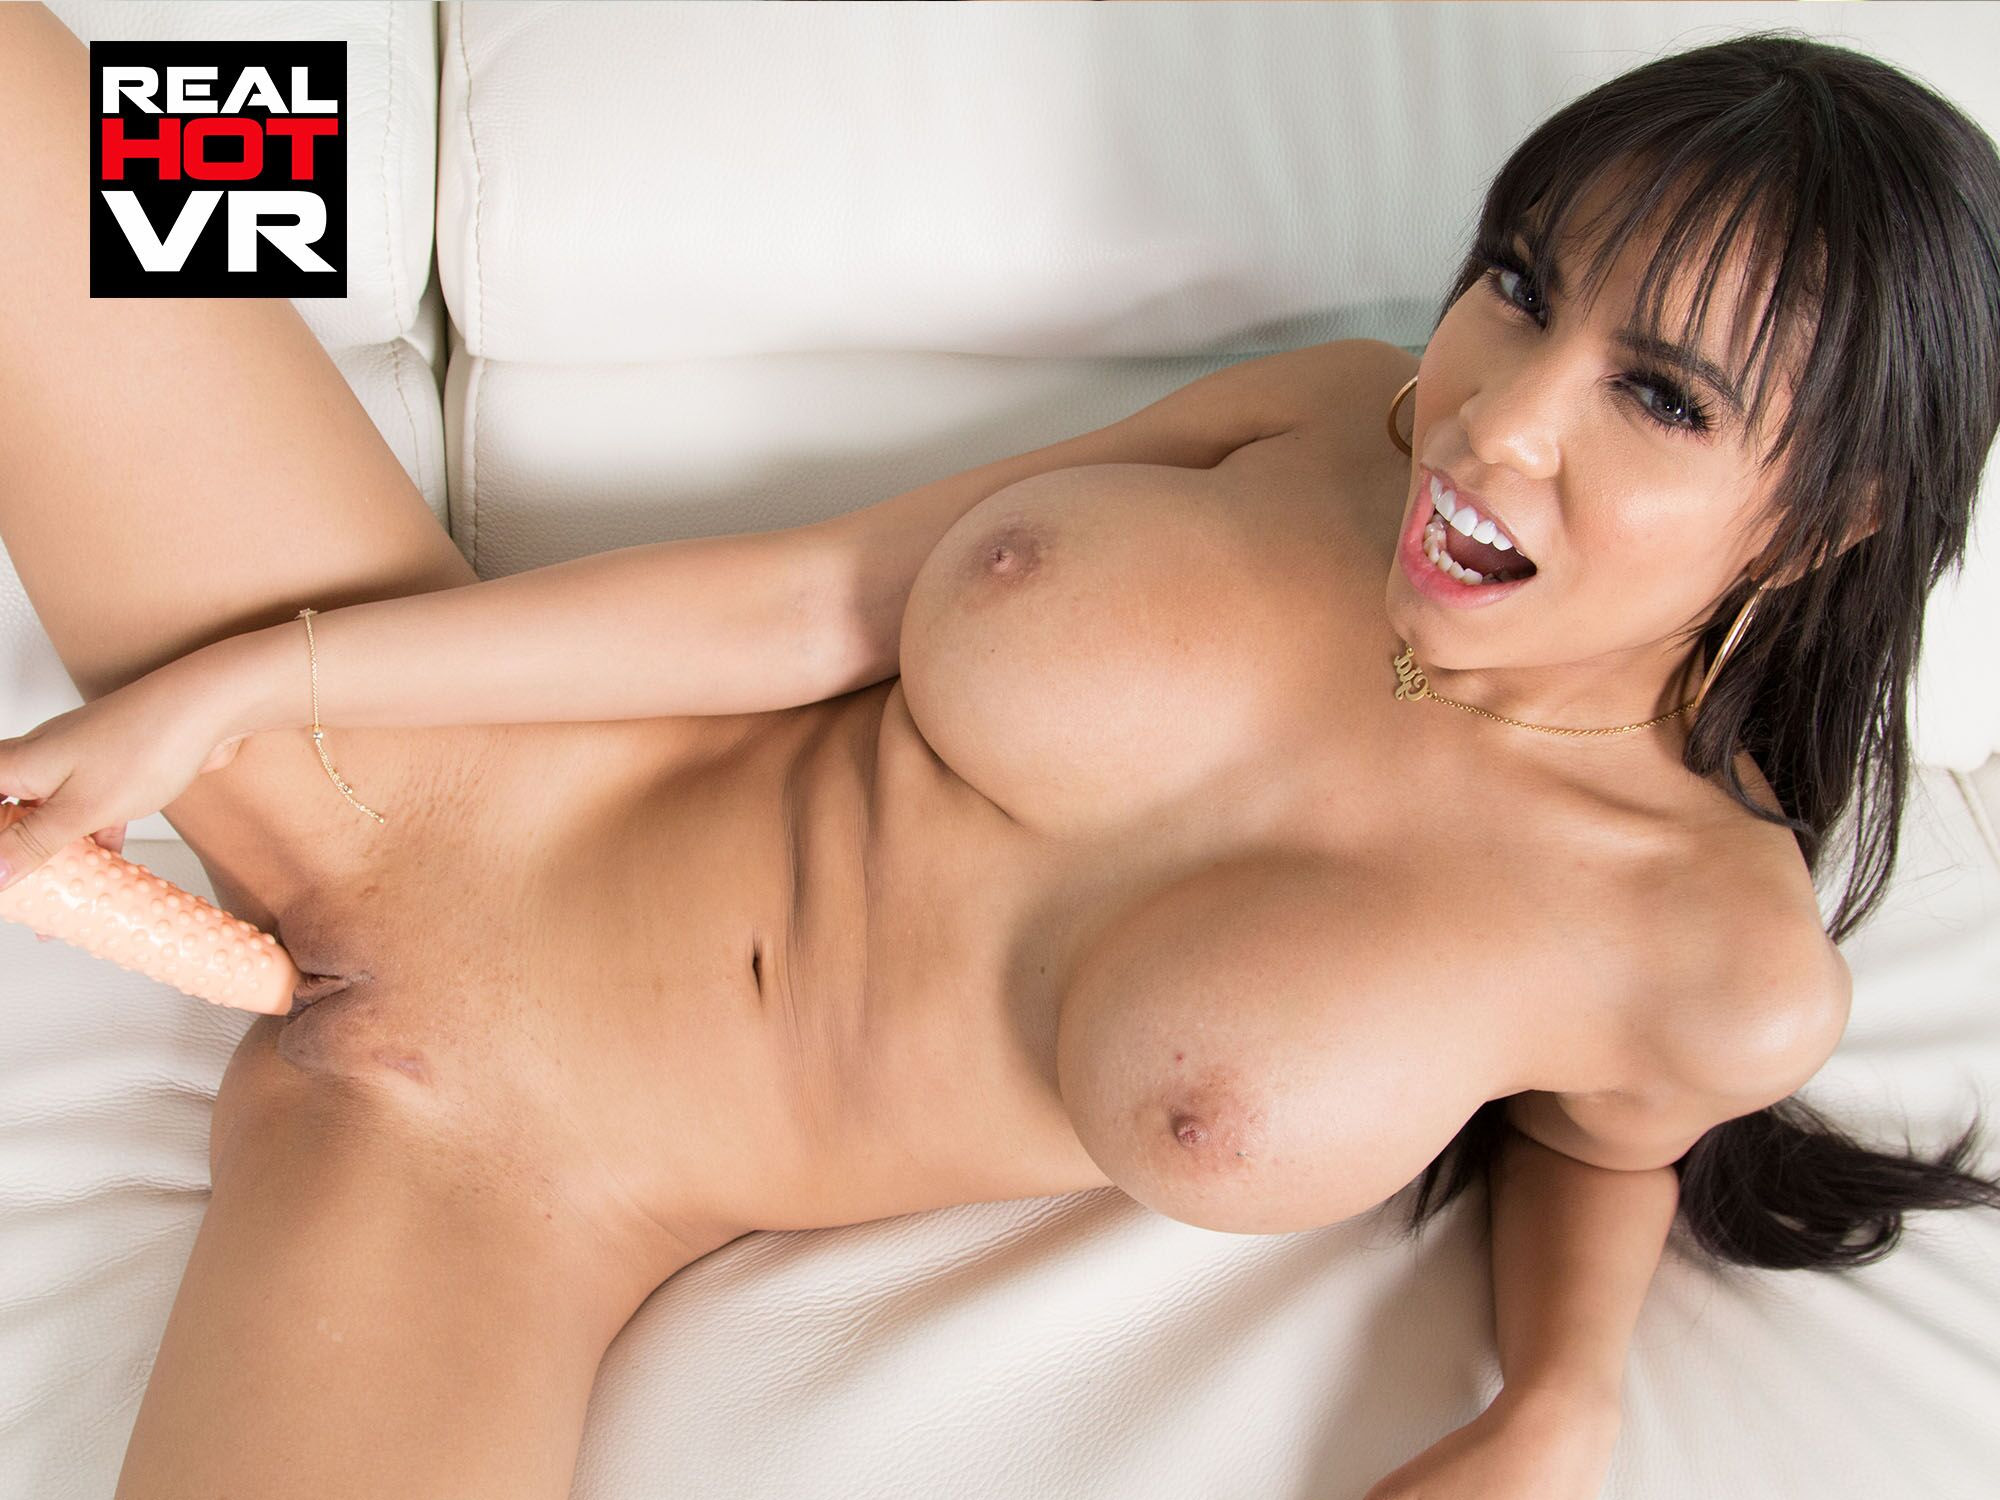 Hot Orgasm Pussy Juicy - VR Porn Babes Directory